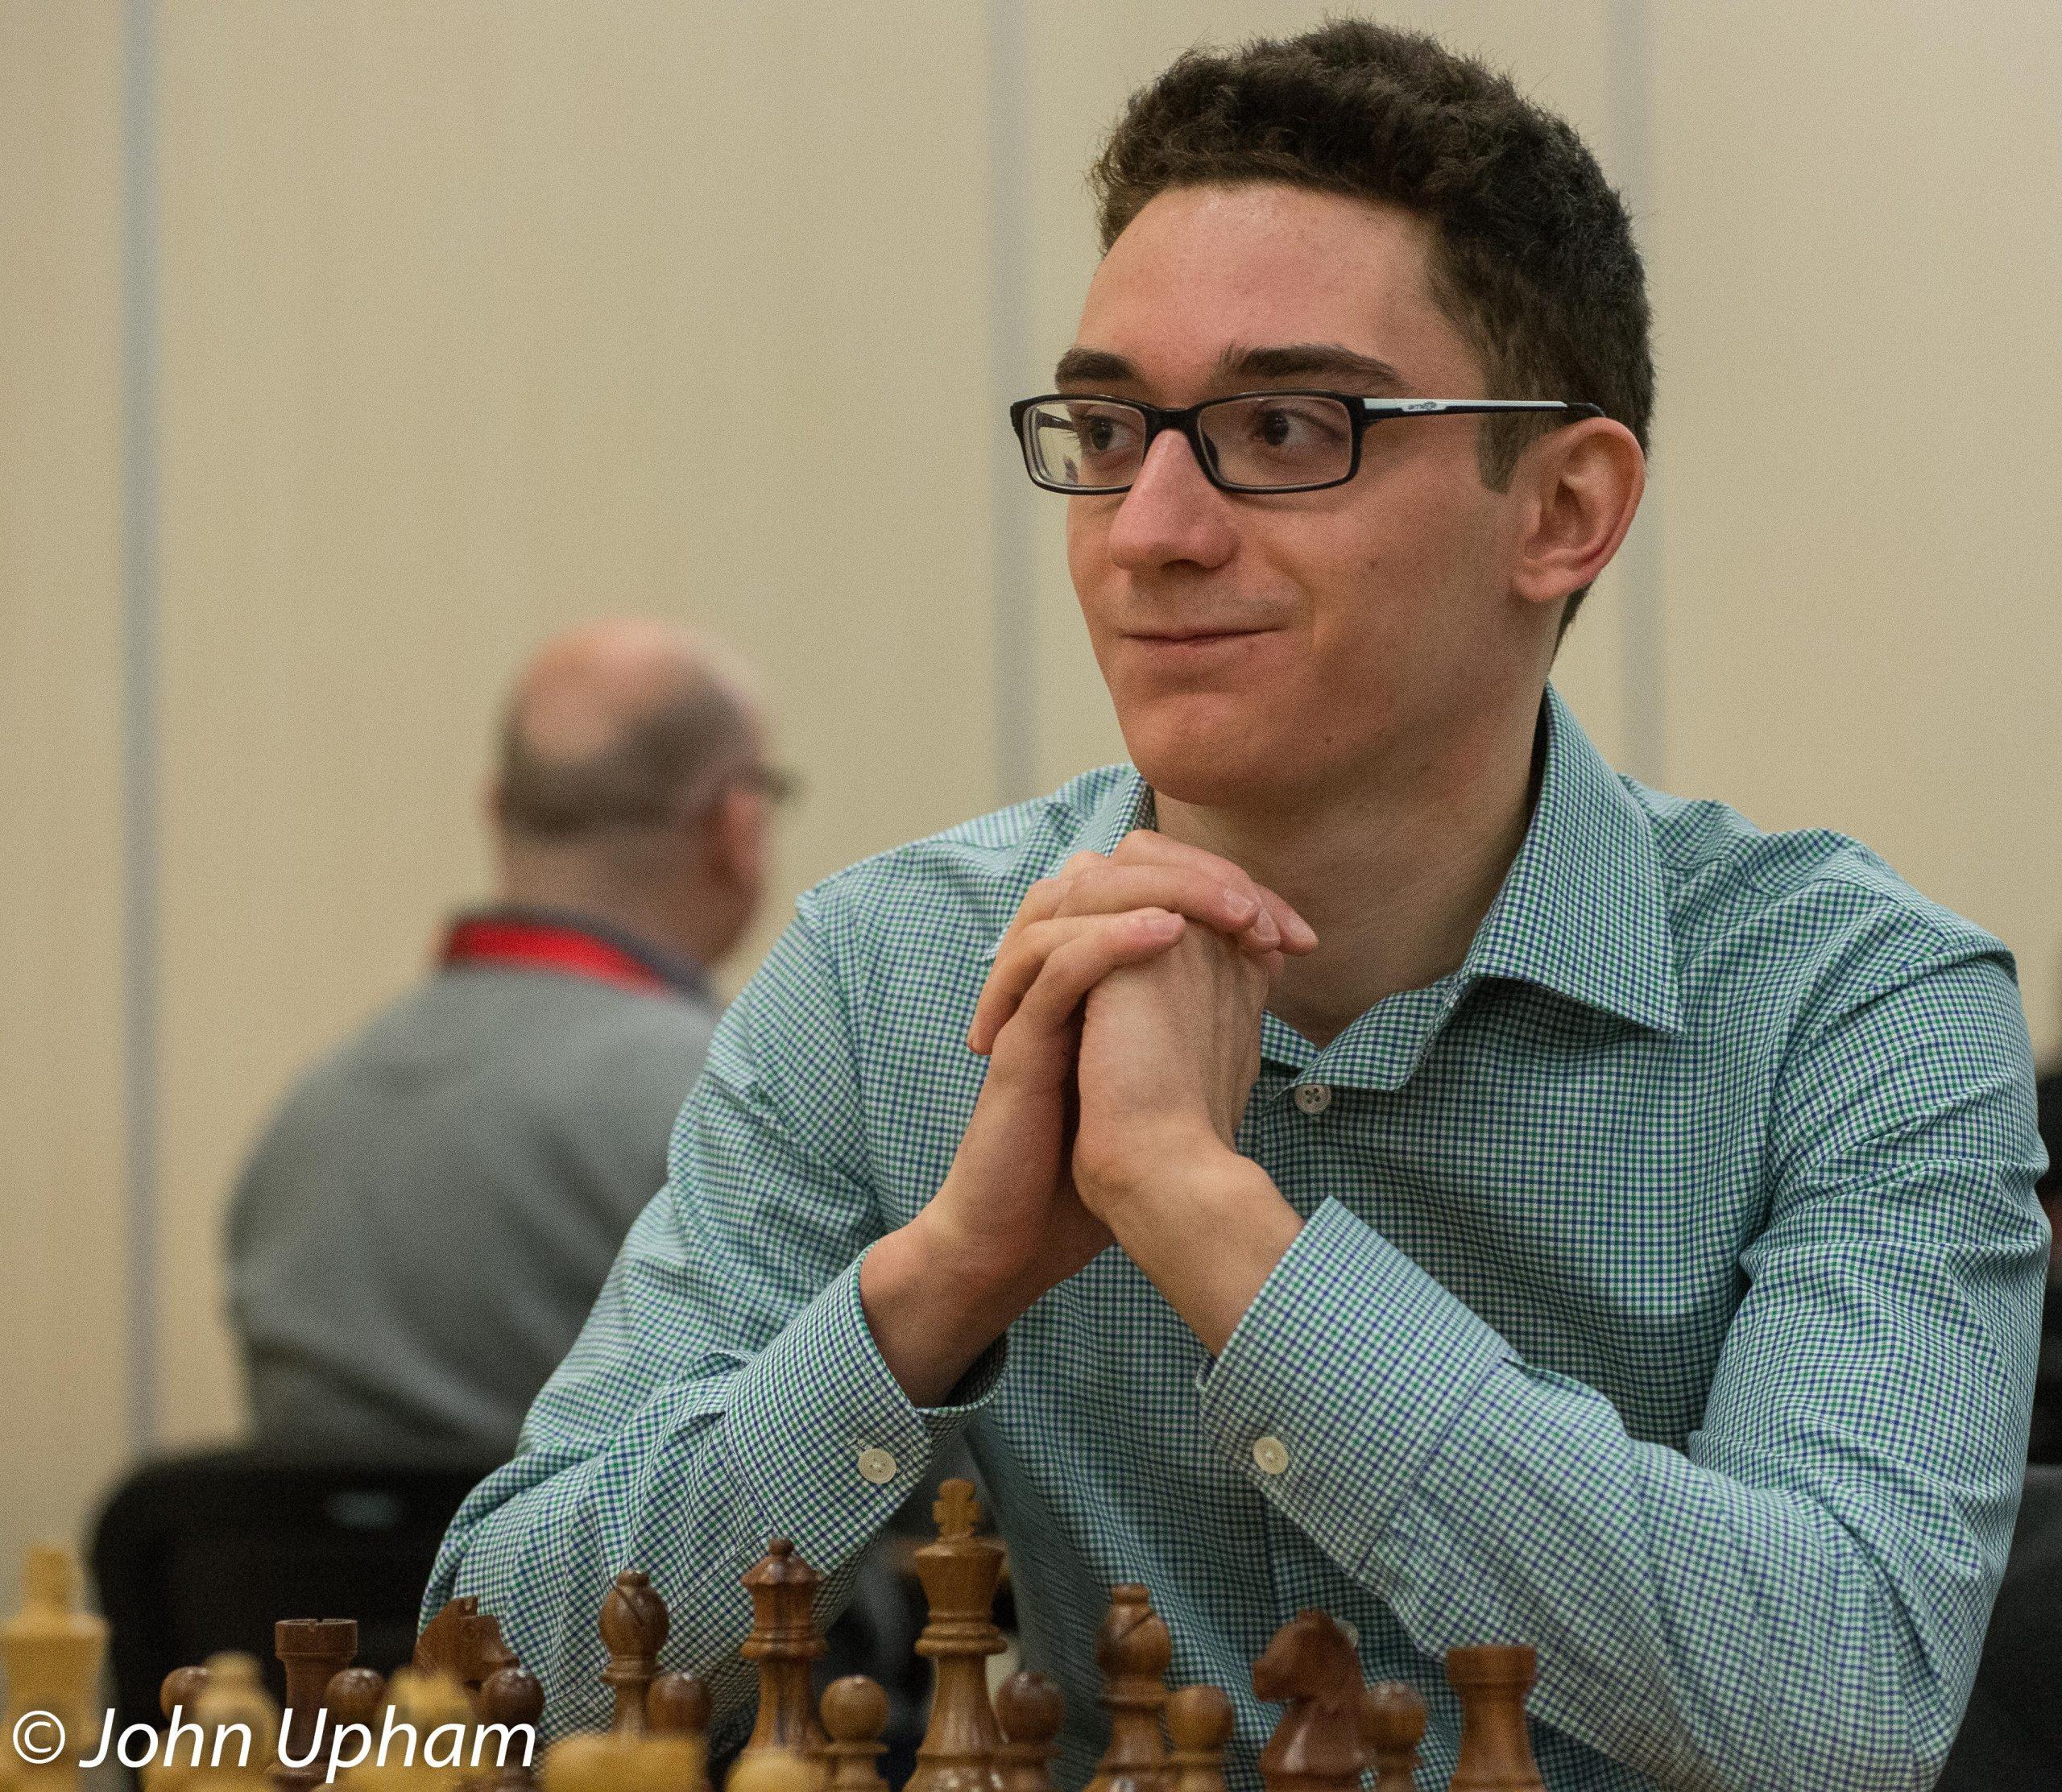 GM Fabiano Caruana, London Chess Classic 2014, courtesy of John Upham Photography